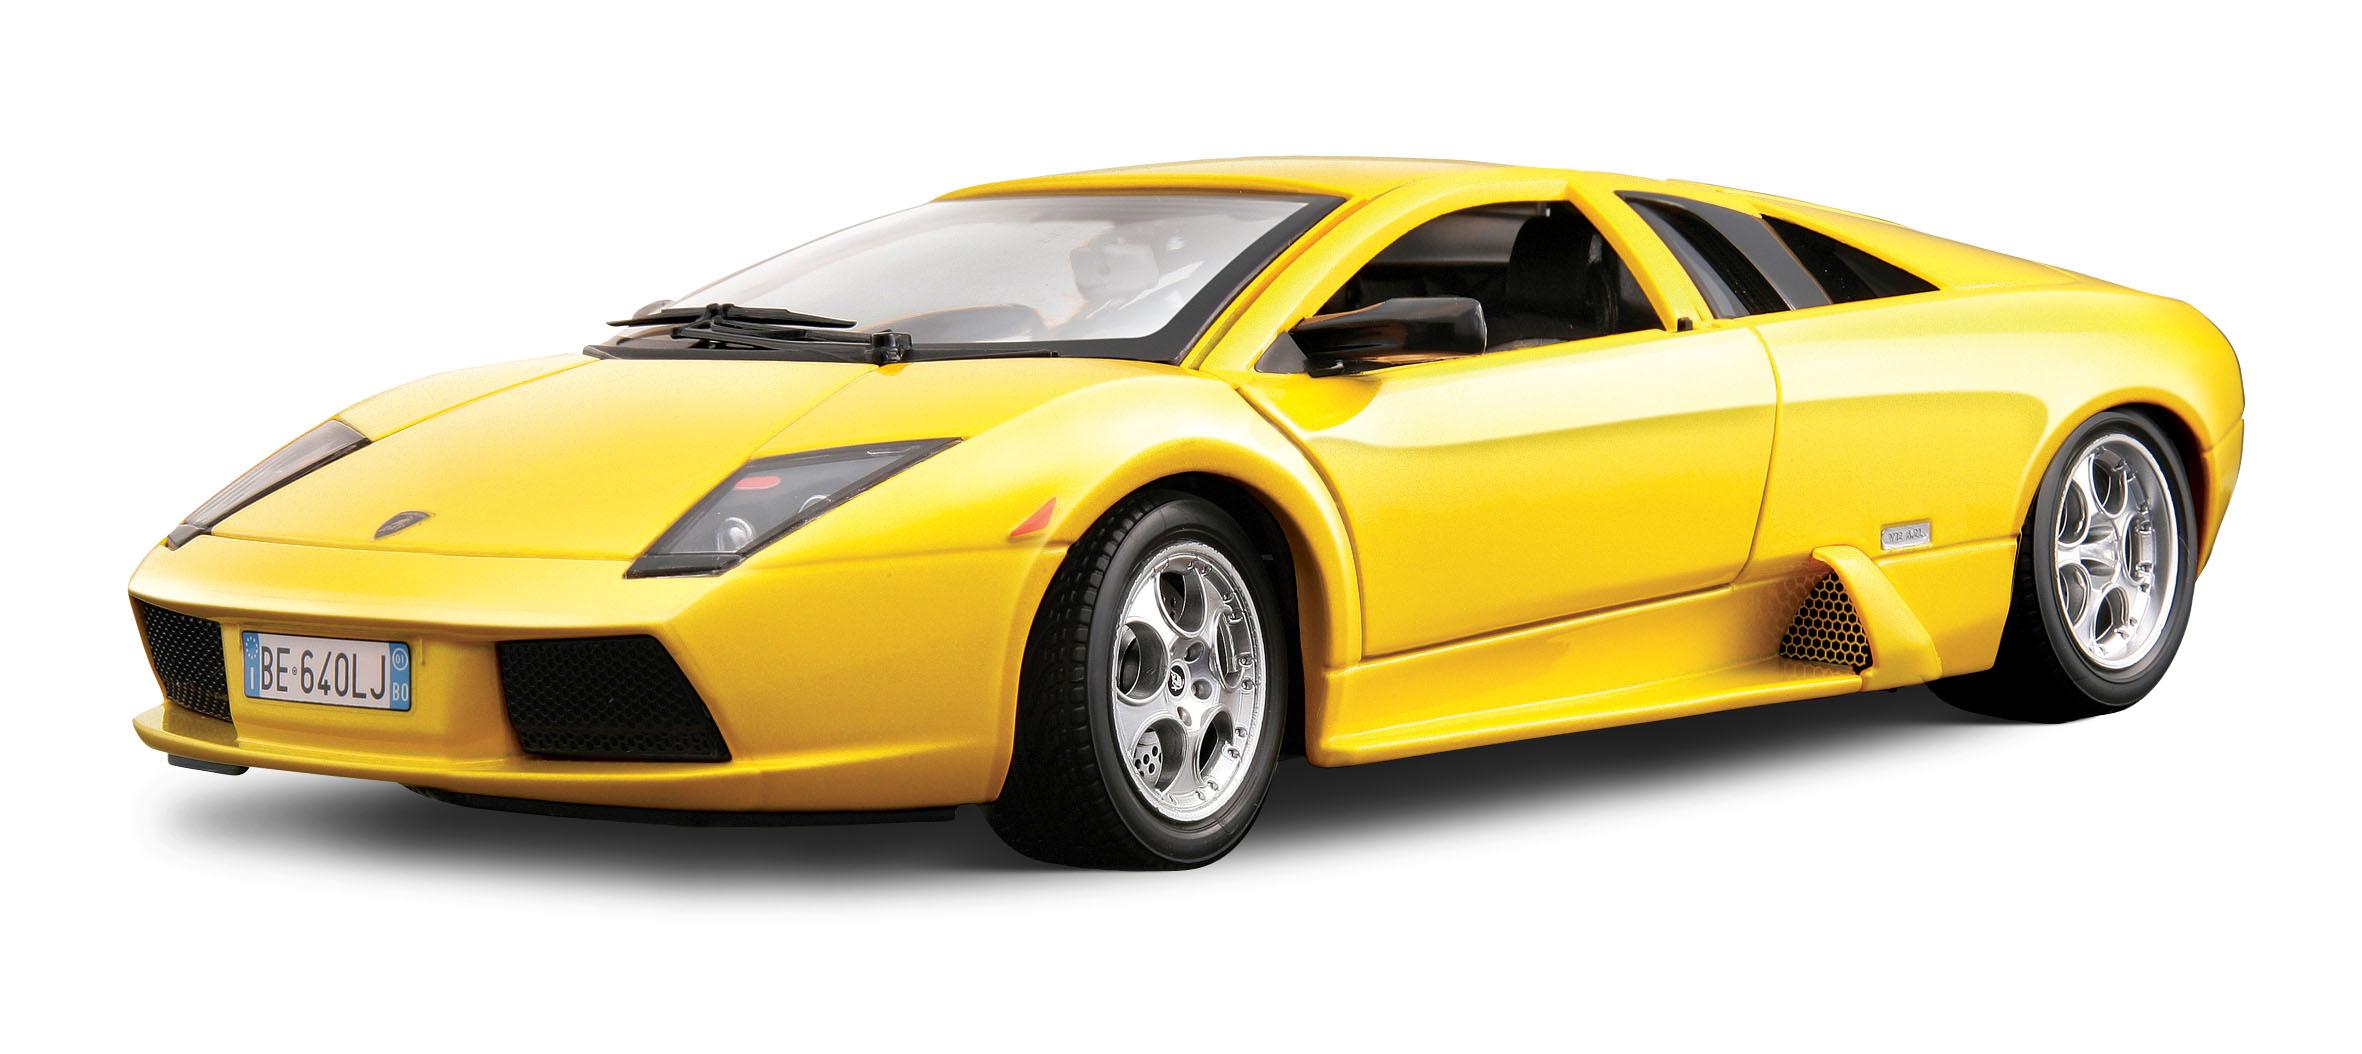 Hattons Co Uk Burago 18 12022yl Lamborghini Murcielago Yellow